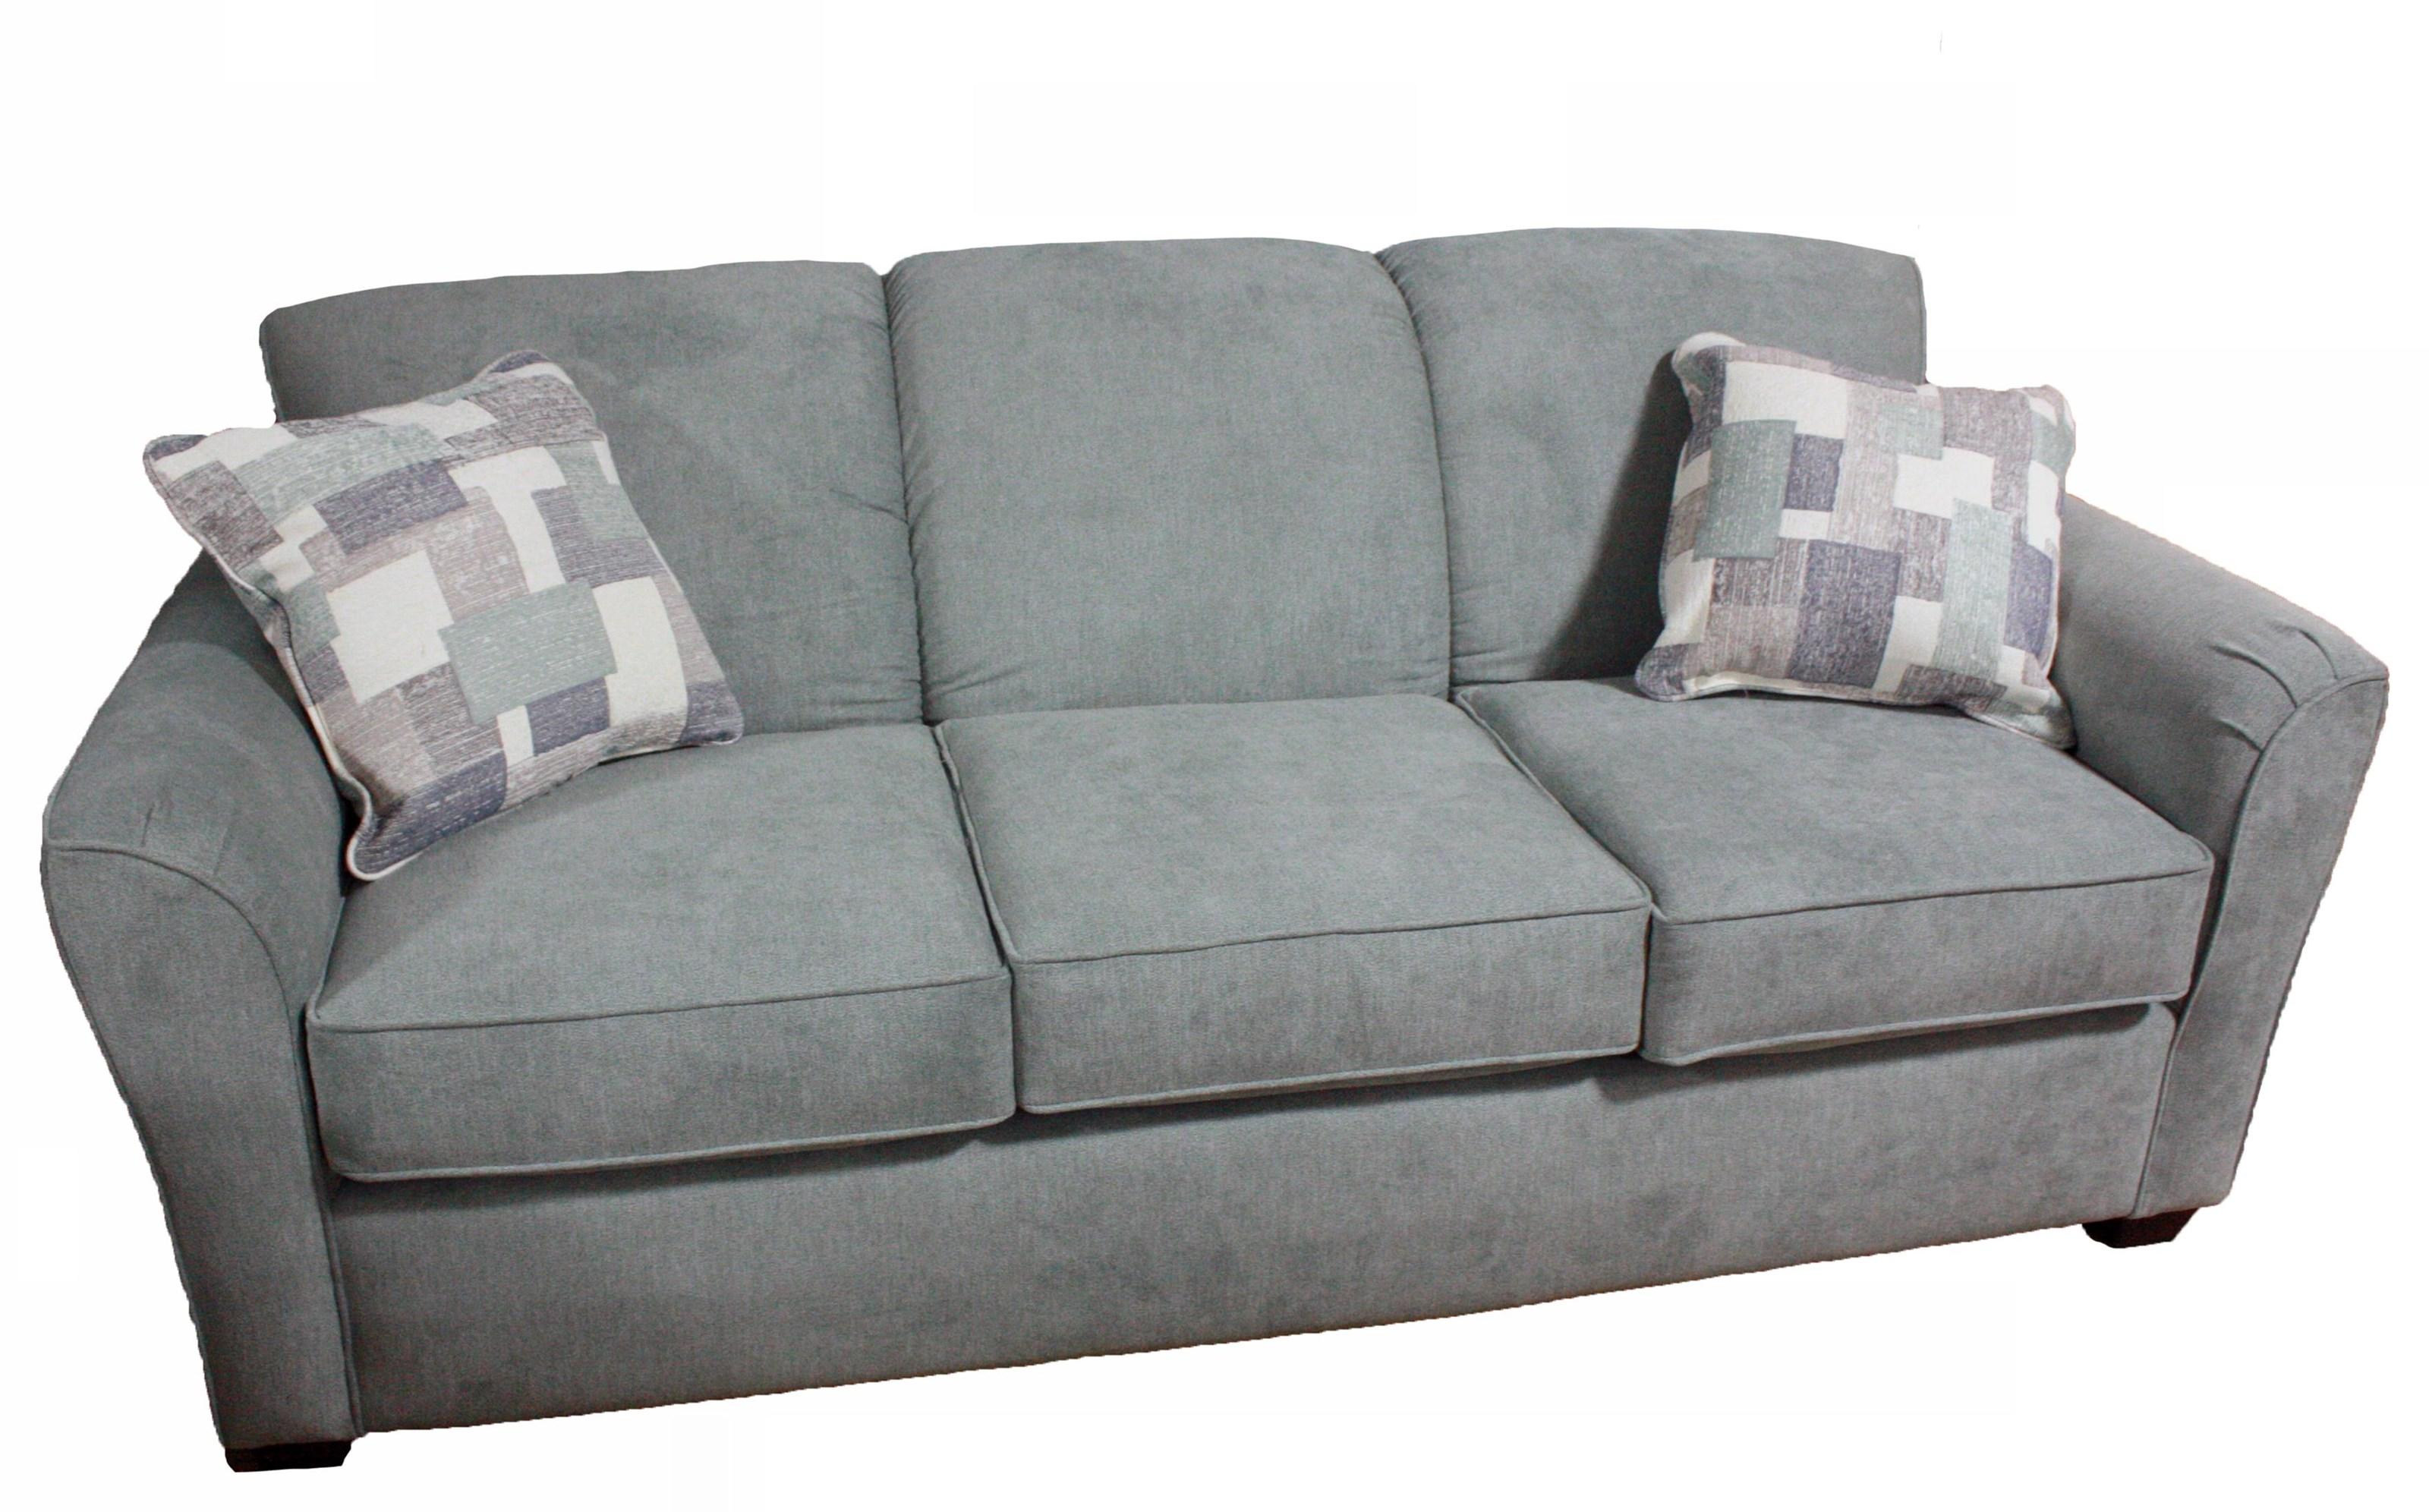 Smyrna SOFA by England at Esprit Decor Home Furnishings